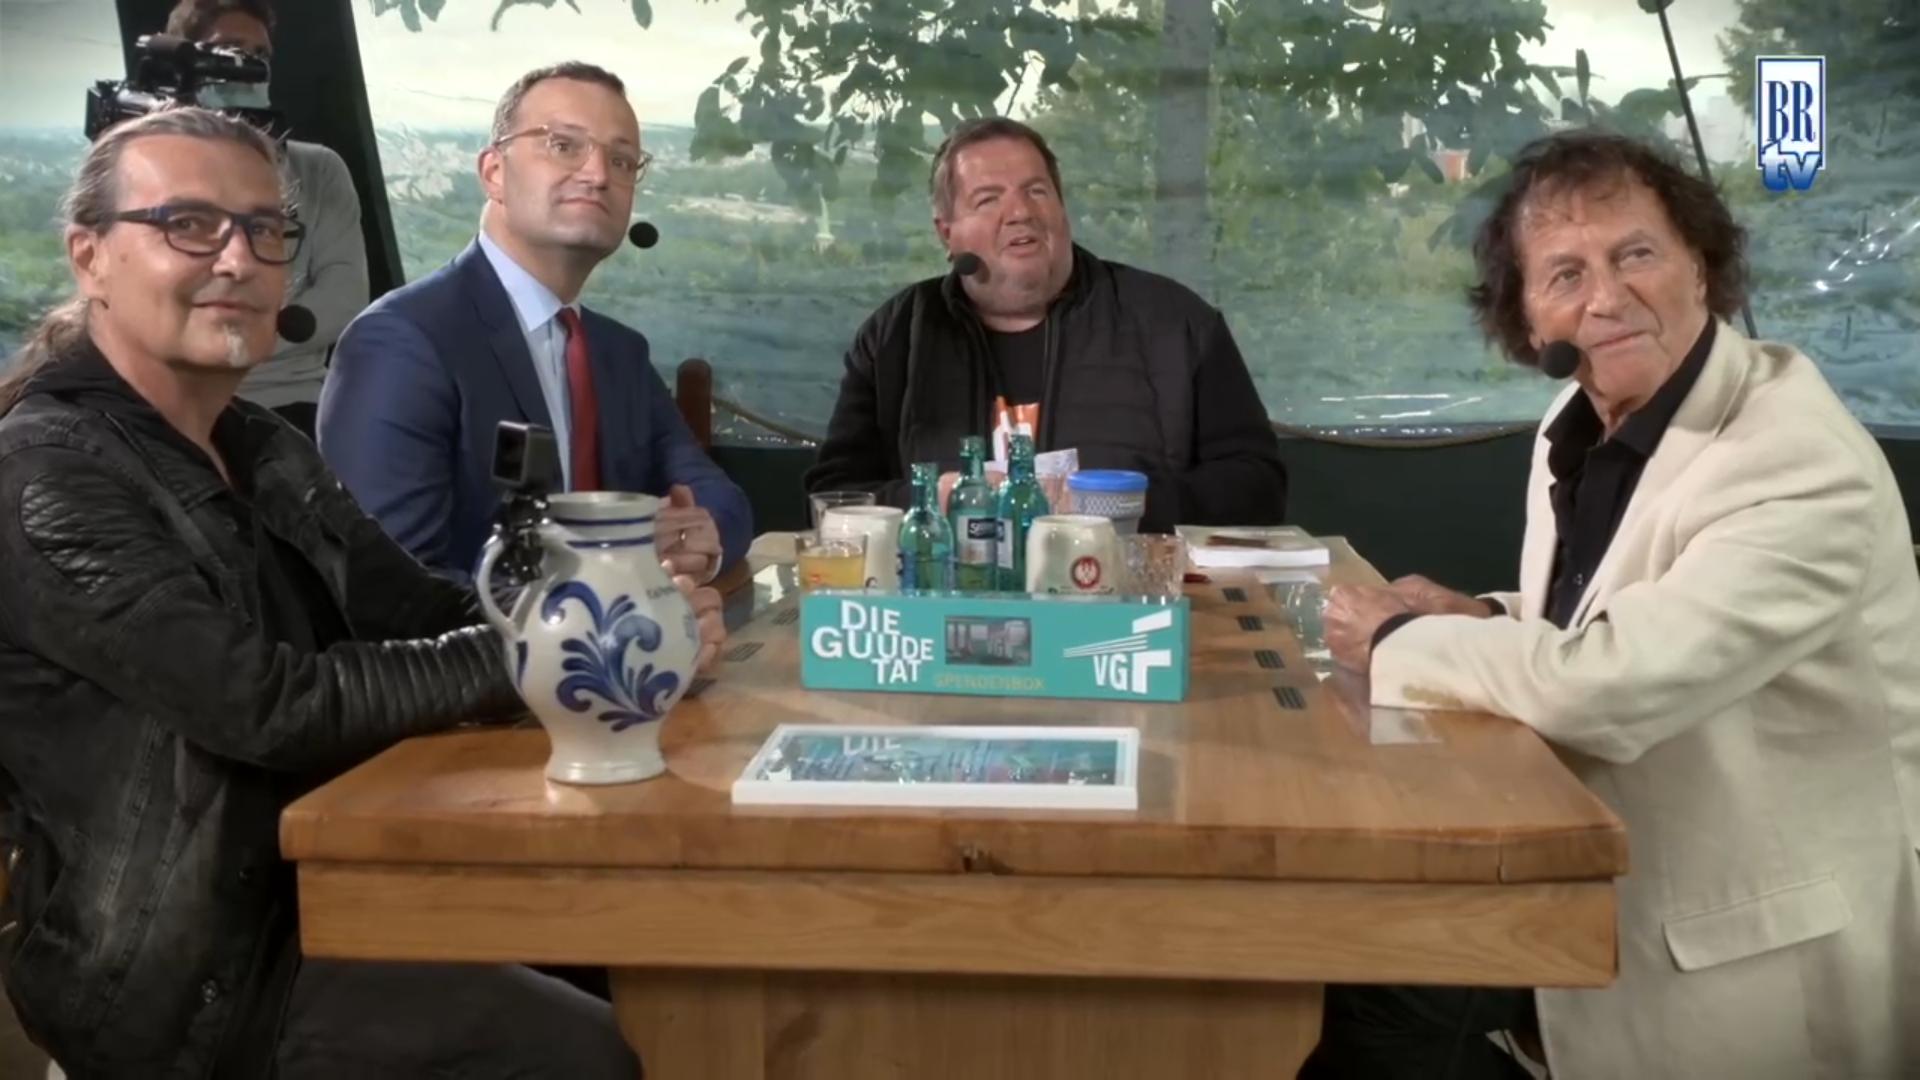 Bembel & Gebabbel – Folge 59 mit Jens Spahn, Franz Lambert & Arno Kösterb